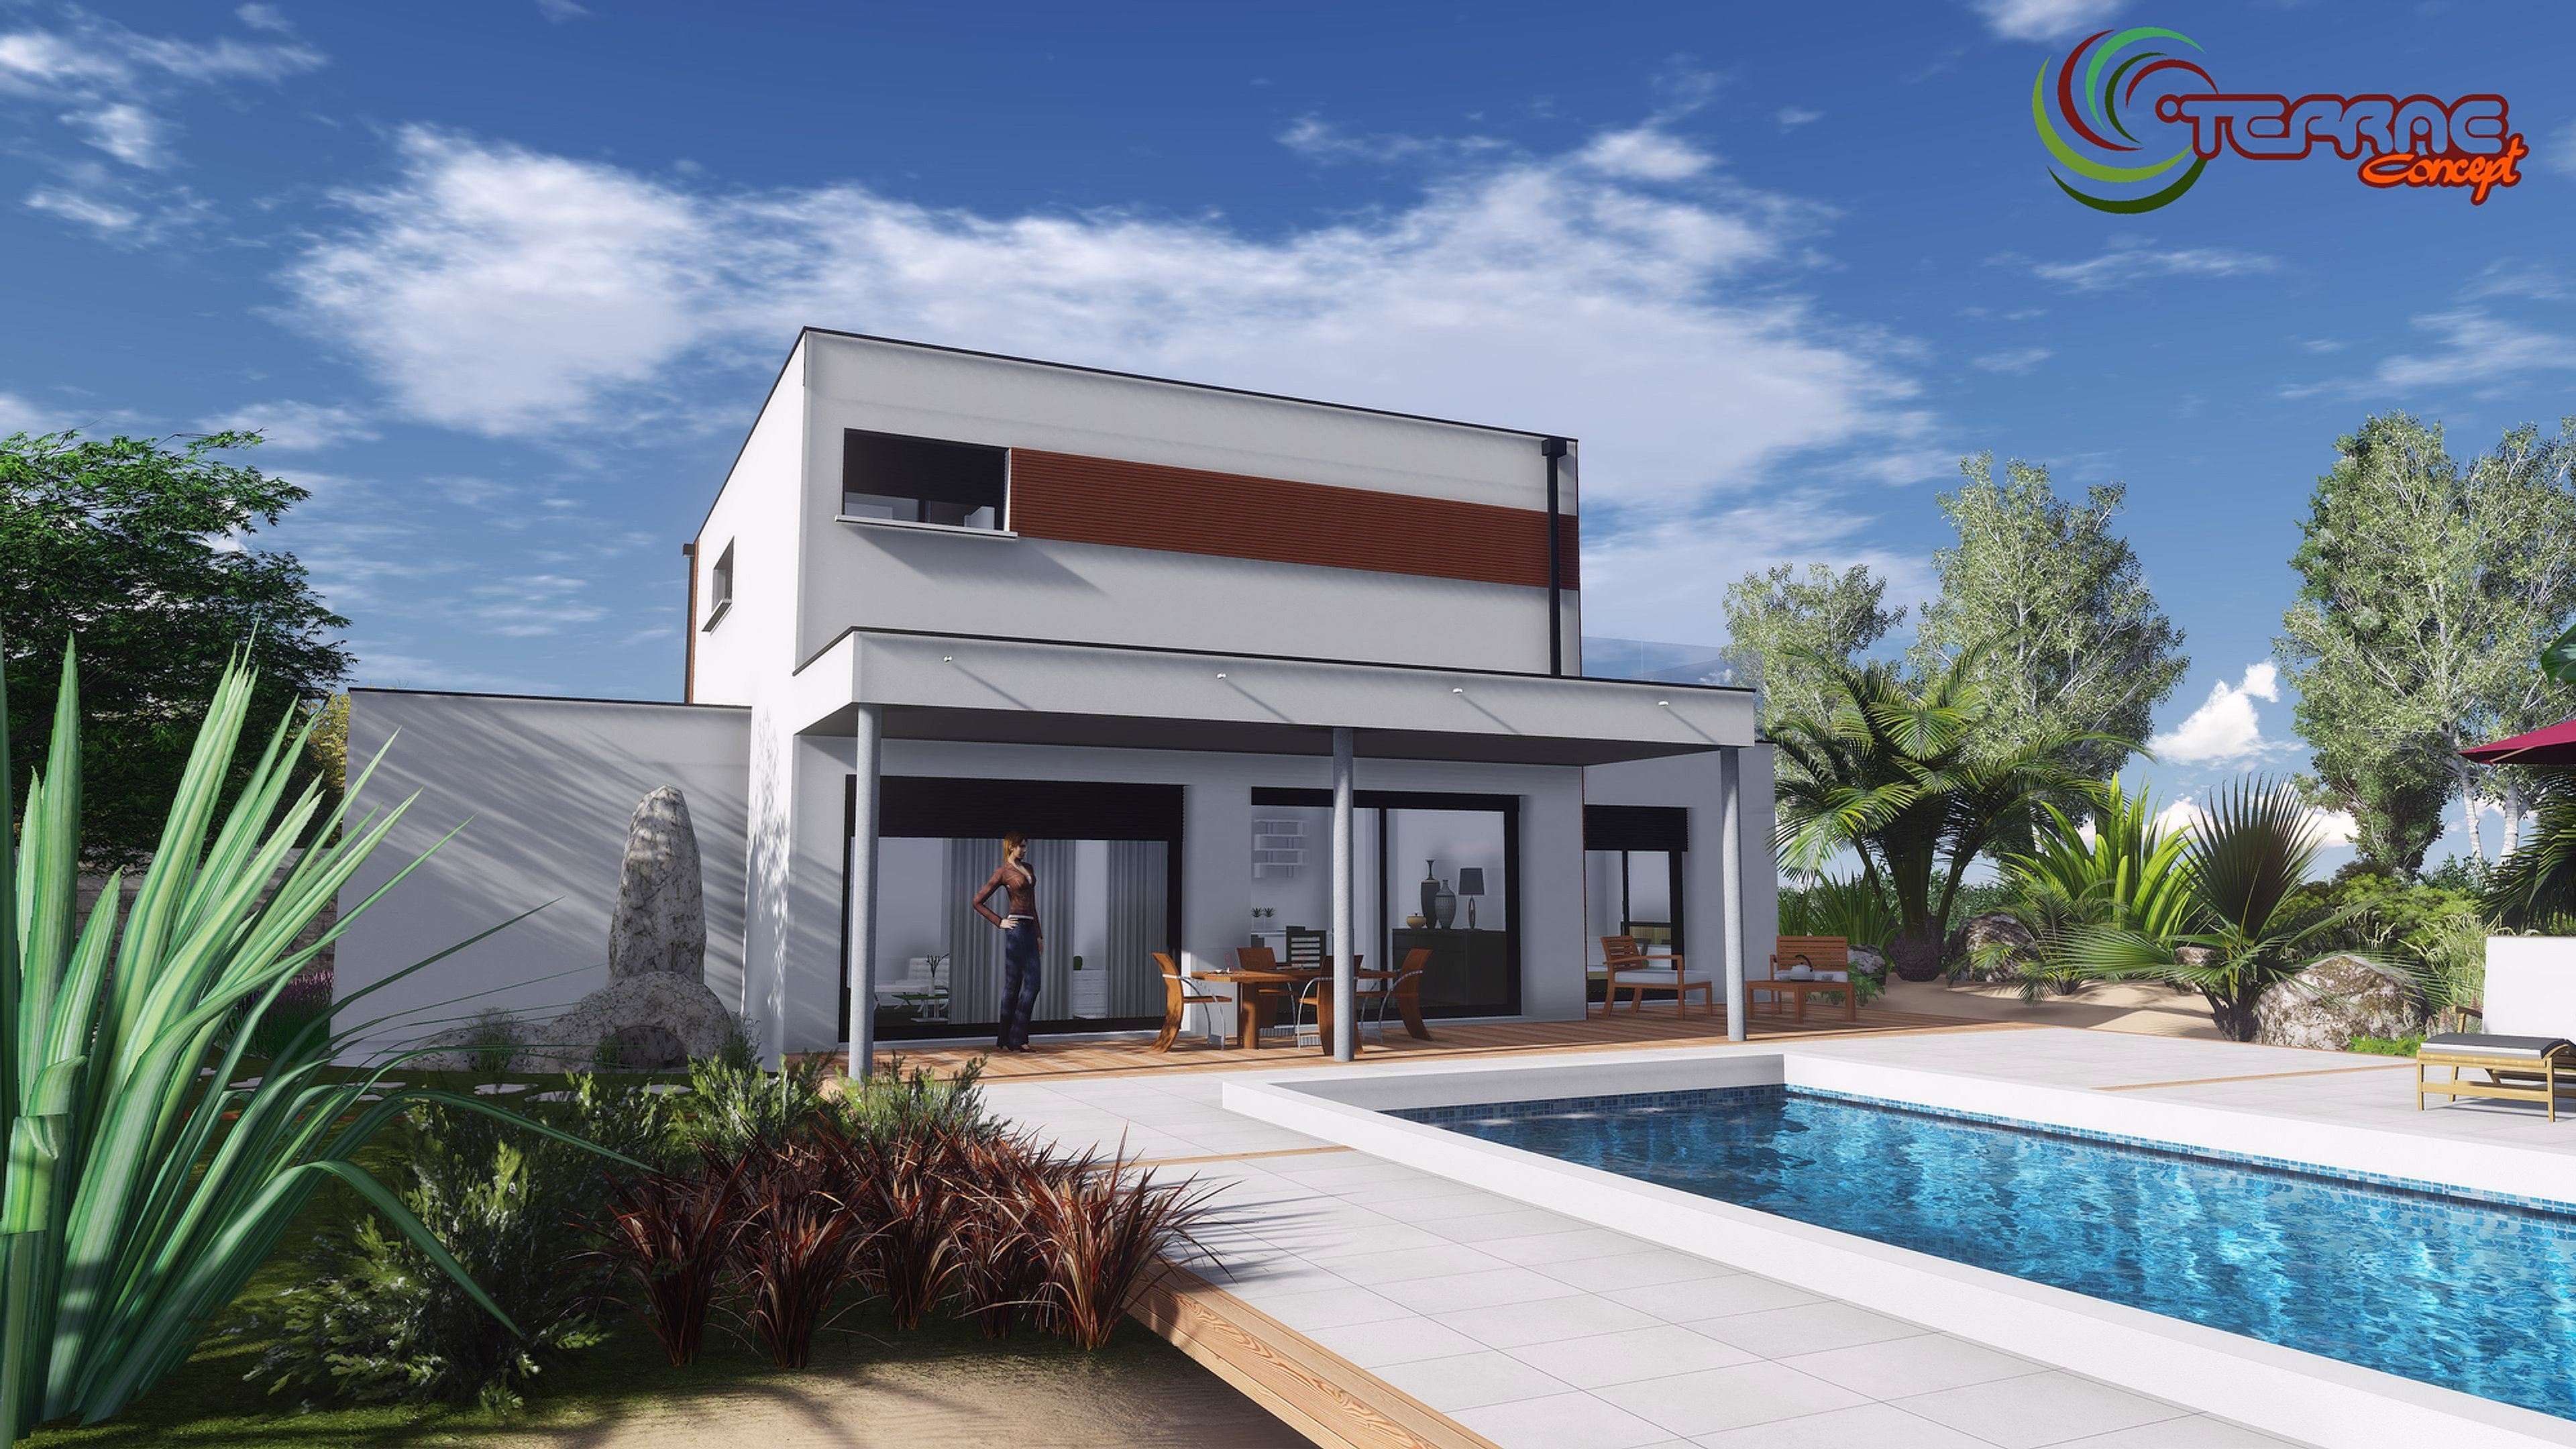 Plan permis de construire france christophe taurel for Permis de construire piscine